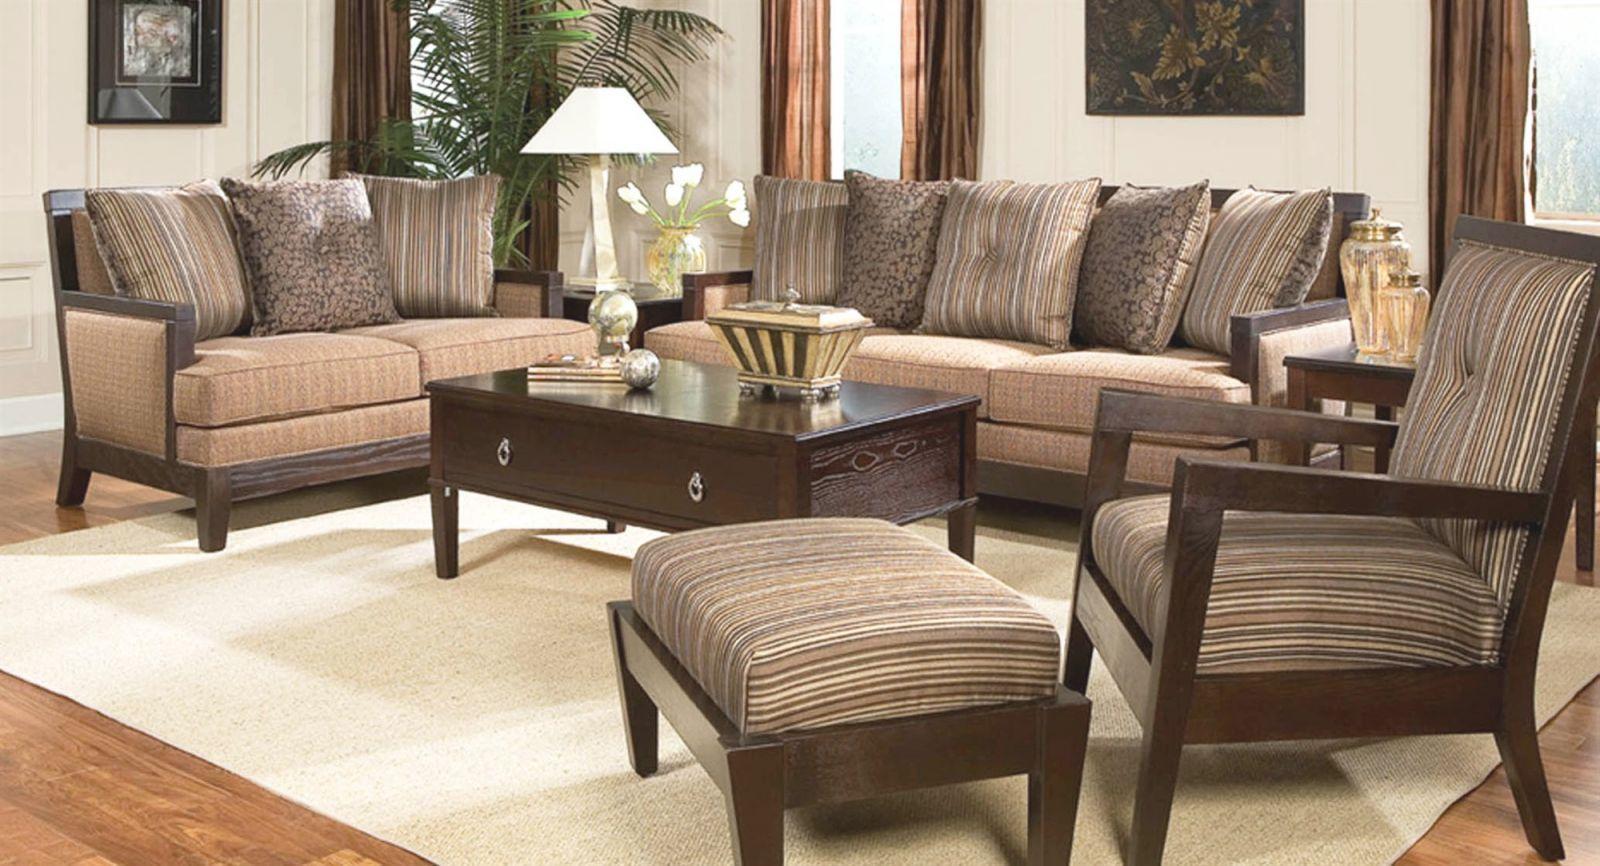 Awesome Living Room Furniture Sets Ikea - Awesome Decors